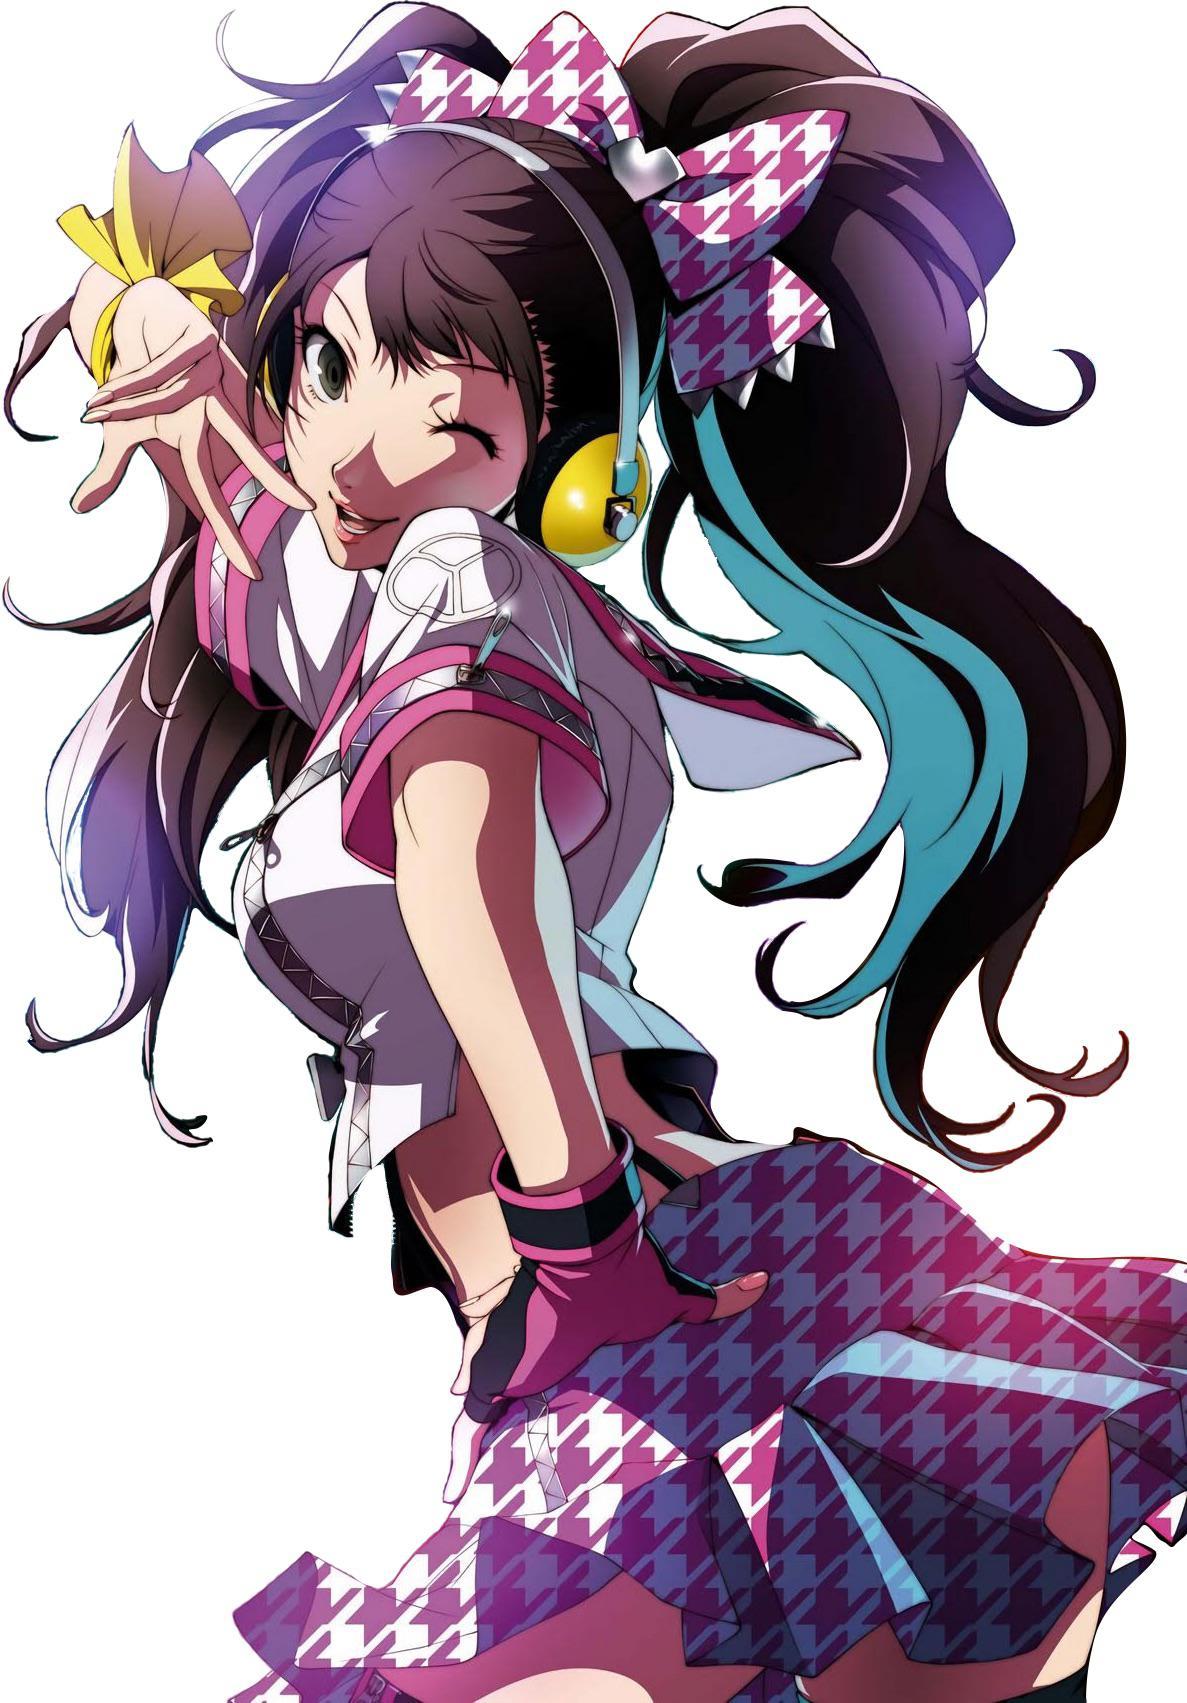 pix Rise Kujikawa Wallpaper render image of rise kujikawa